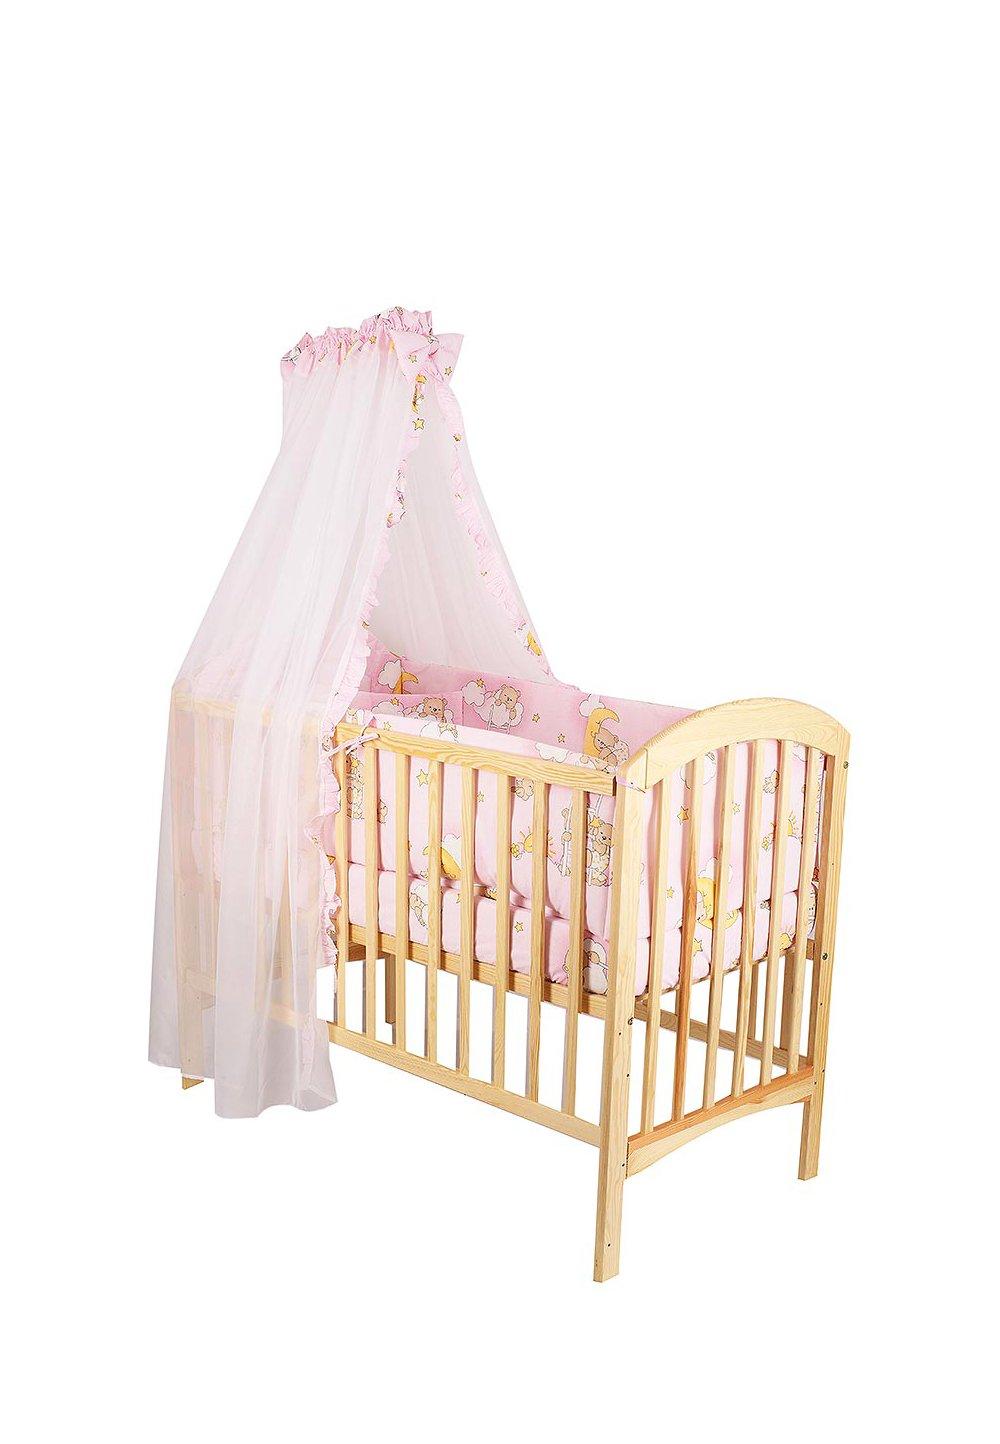 Baldachin patut,ursuletul somnoros, roz, 300x160 cm imagine